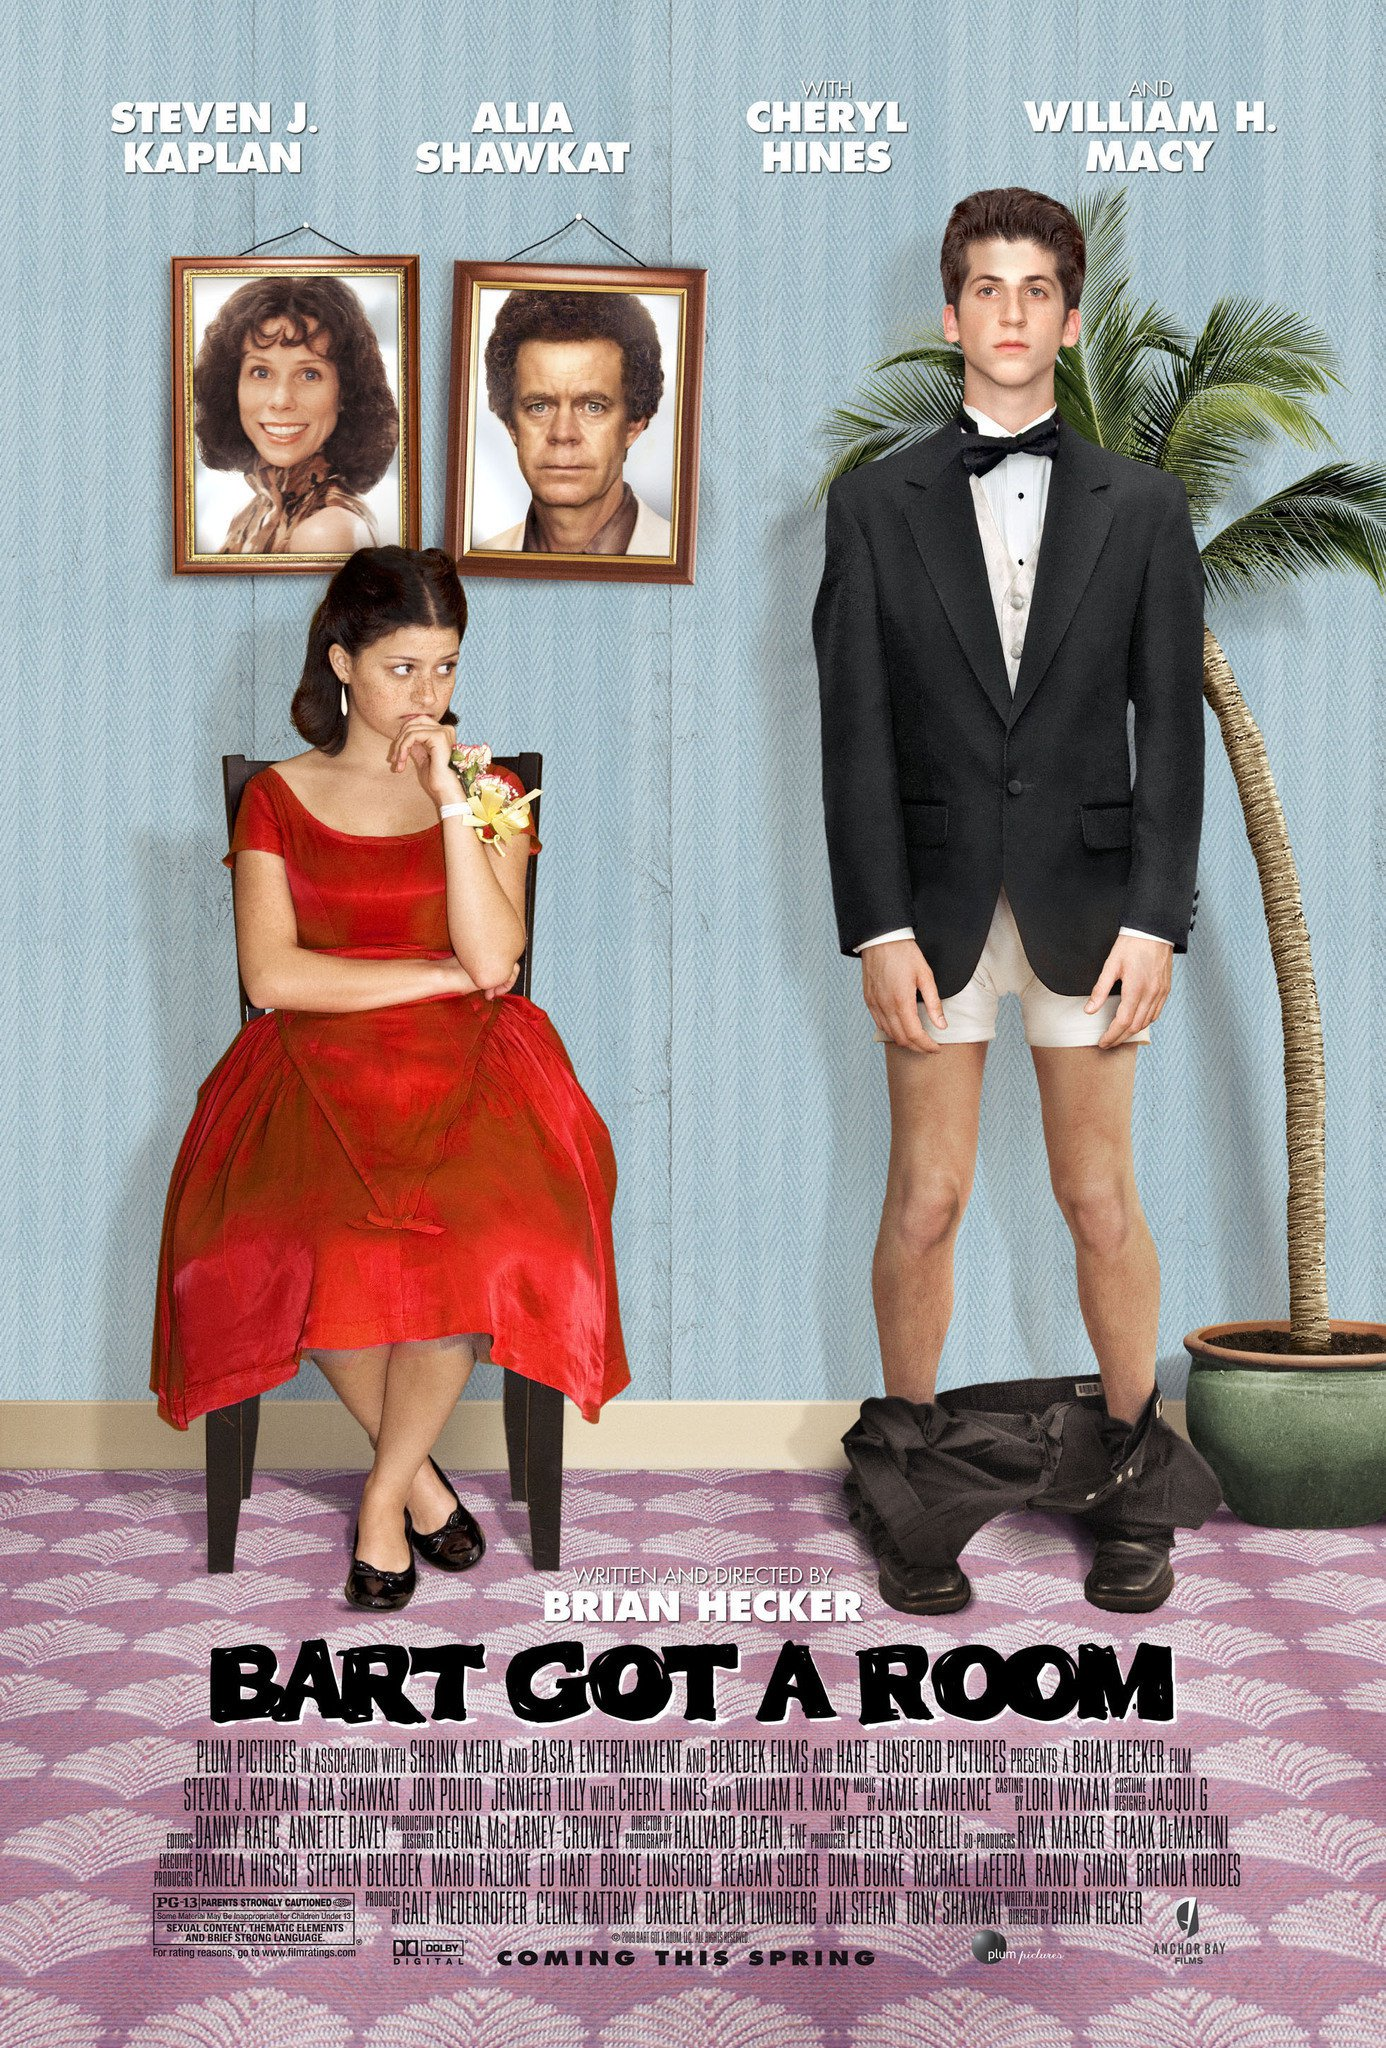 affiche du film Bart Got a Room